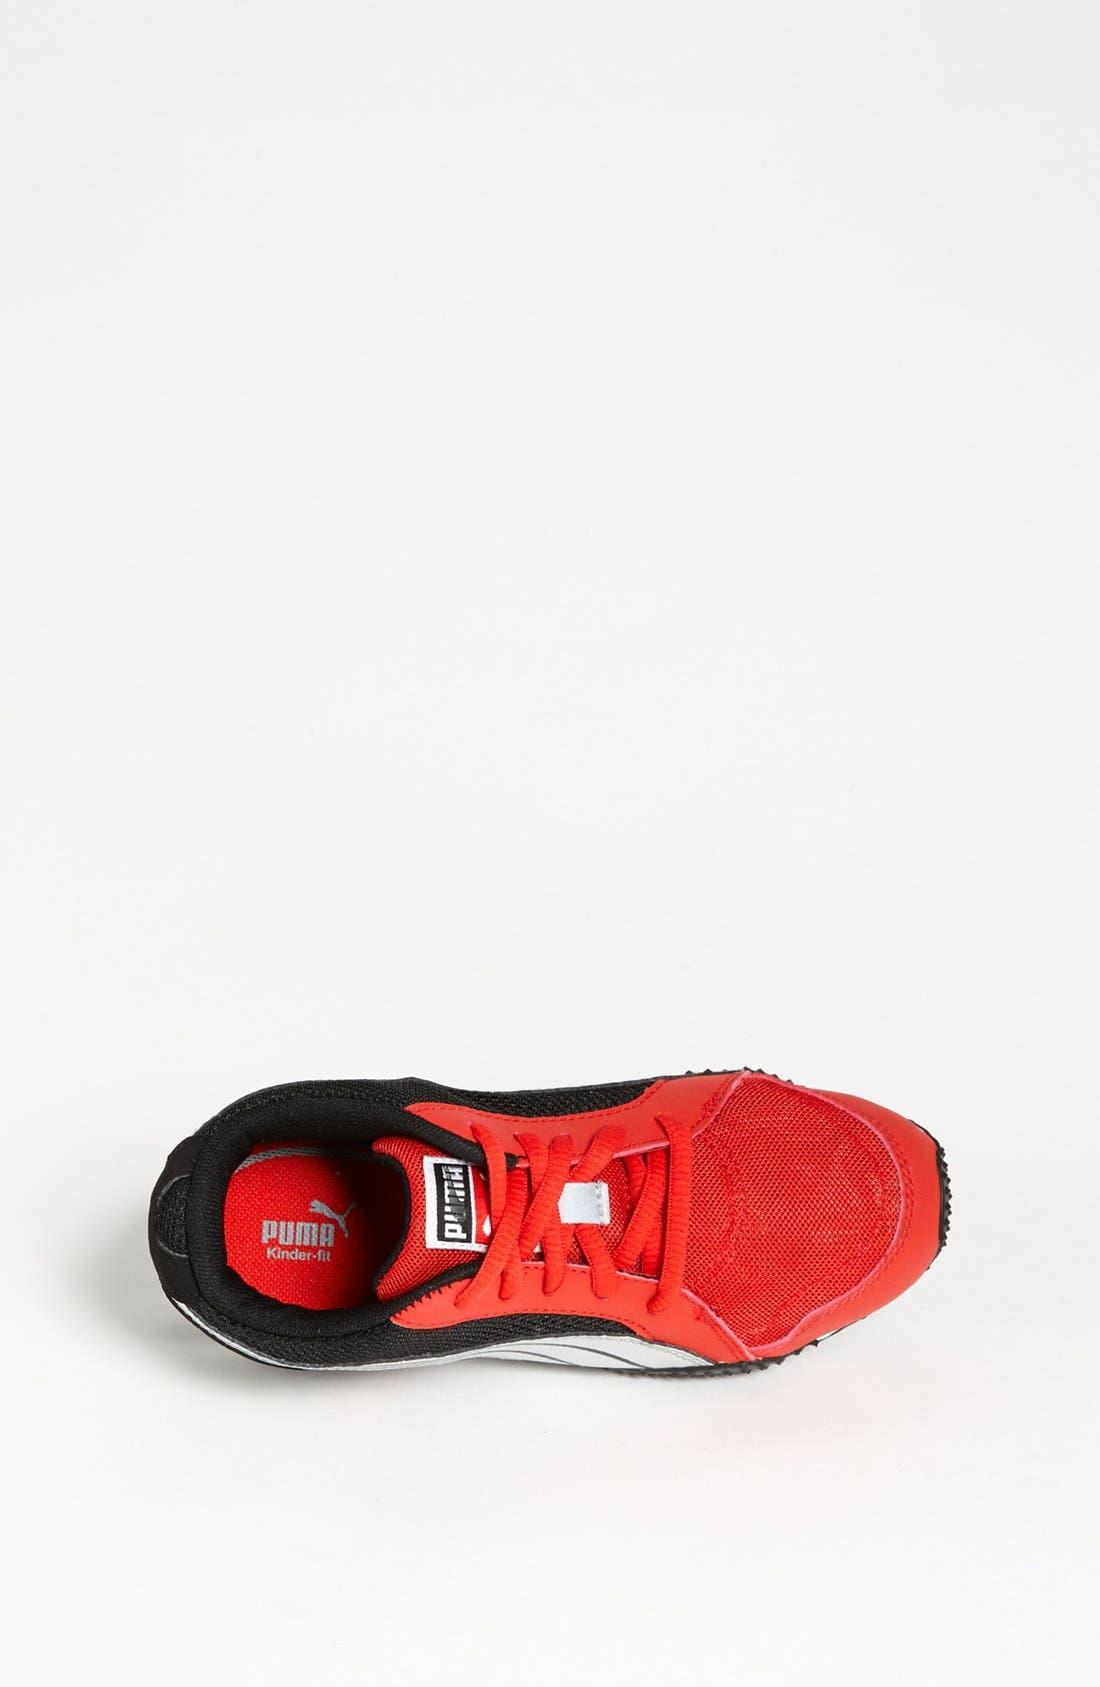 Alternate Image 3  - PUMA 'H-Mesh' Sneaker (Toddler, Little Kid & Big Kid)